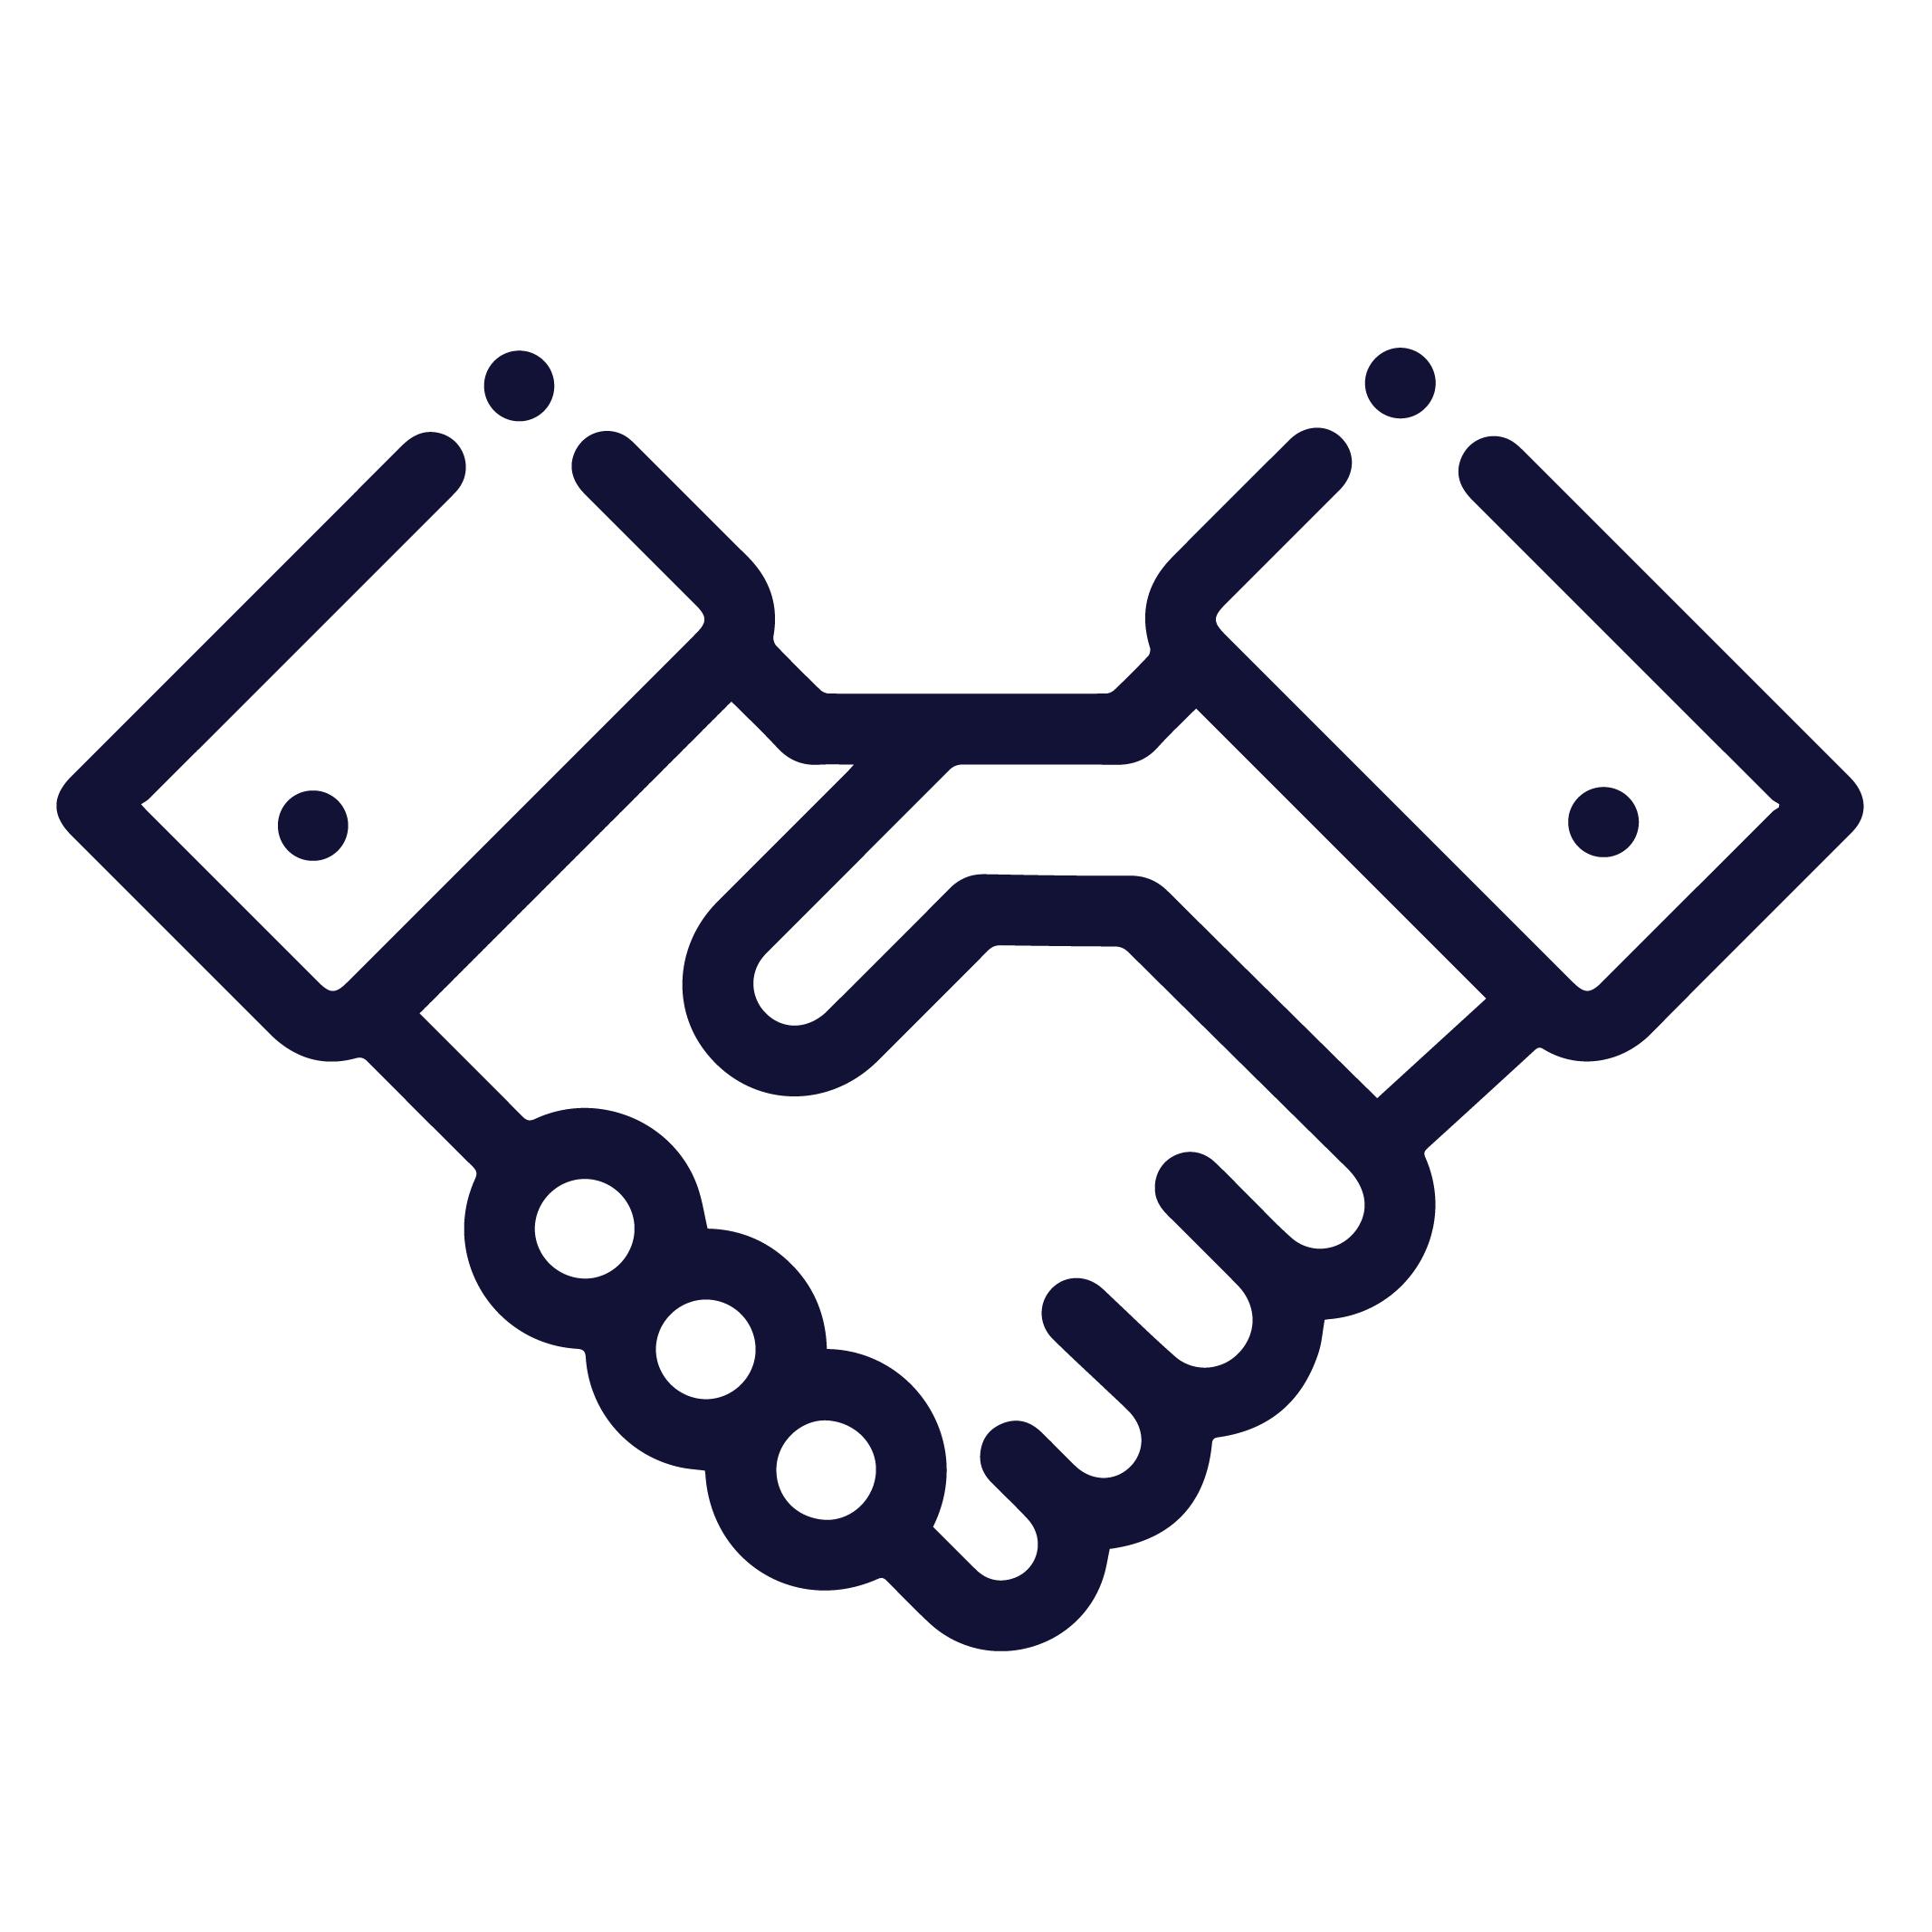 Novo_Handshake.png